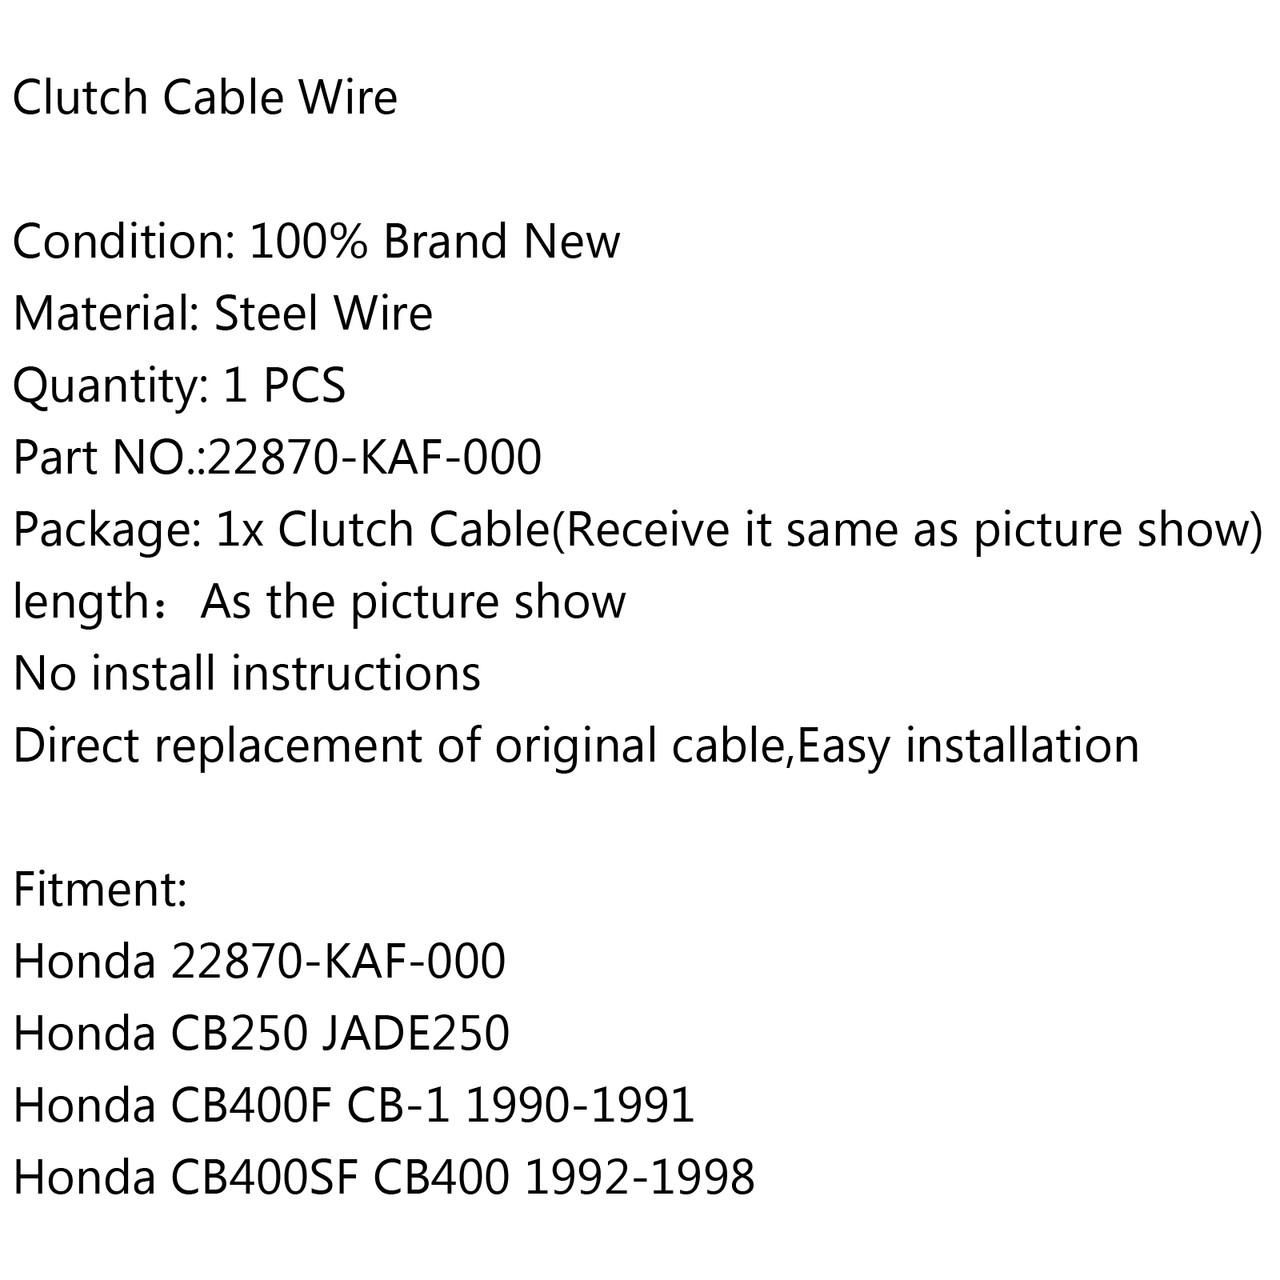 Clutch Cable 22870-KAF-000 Honda CB250 JADE250 CB400F CB-1 CB400SF CB400